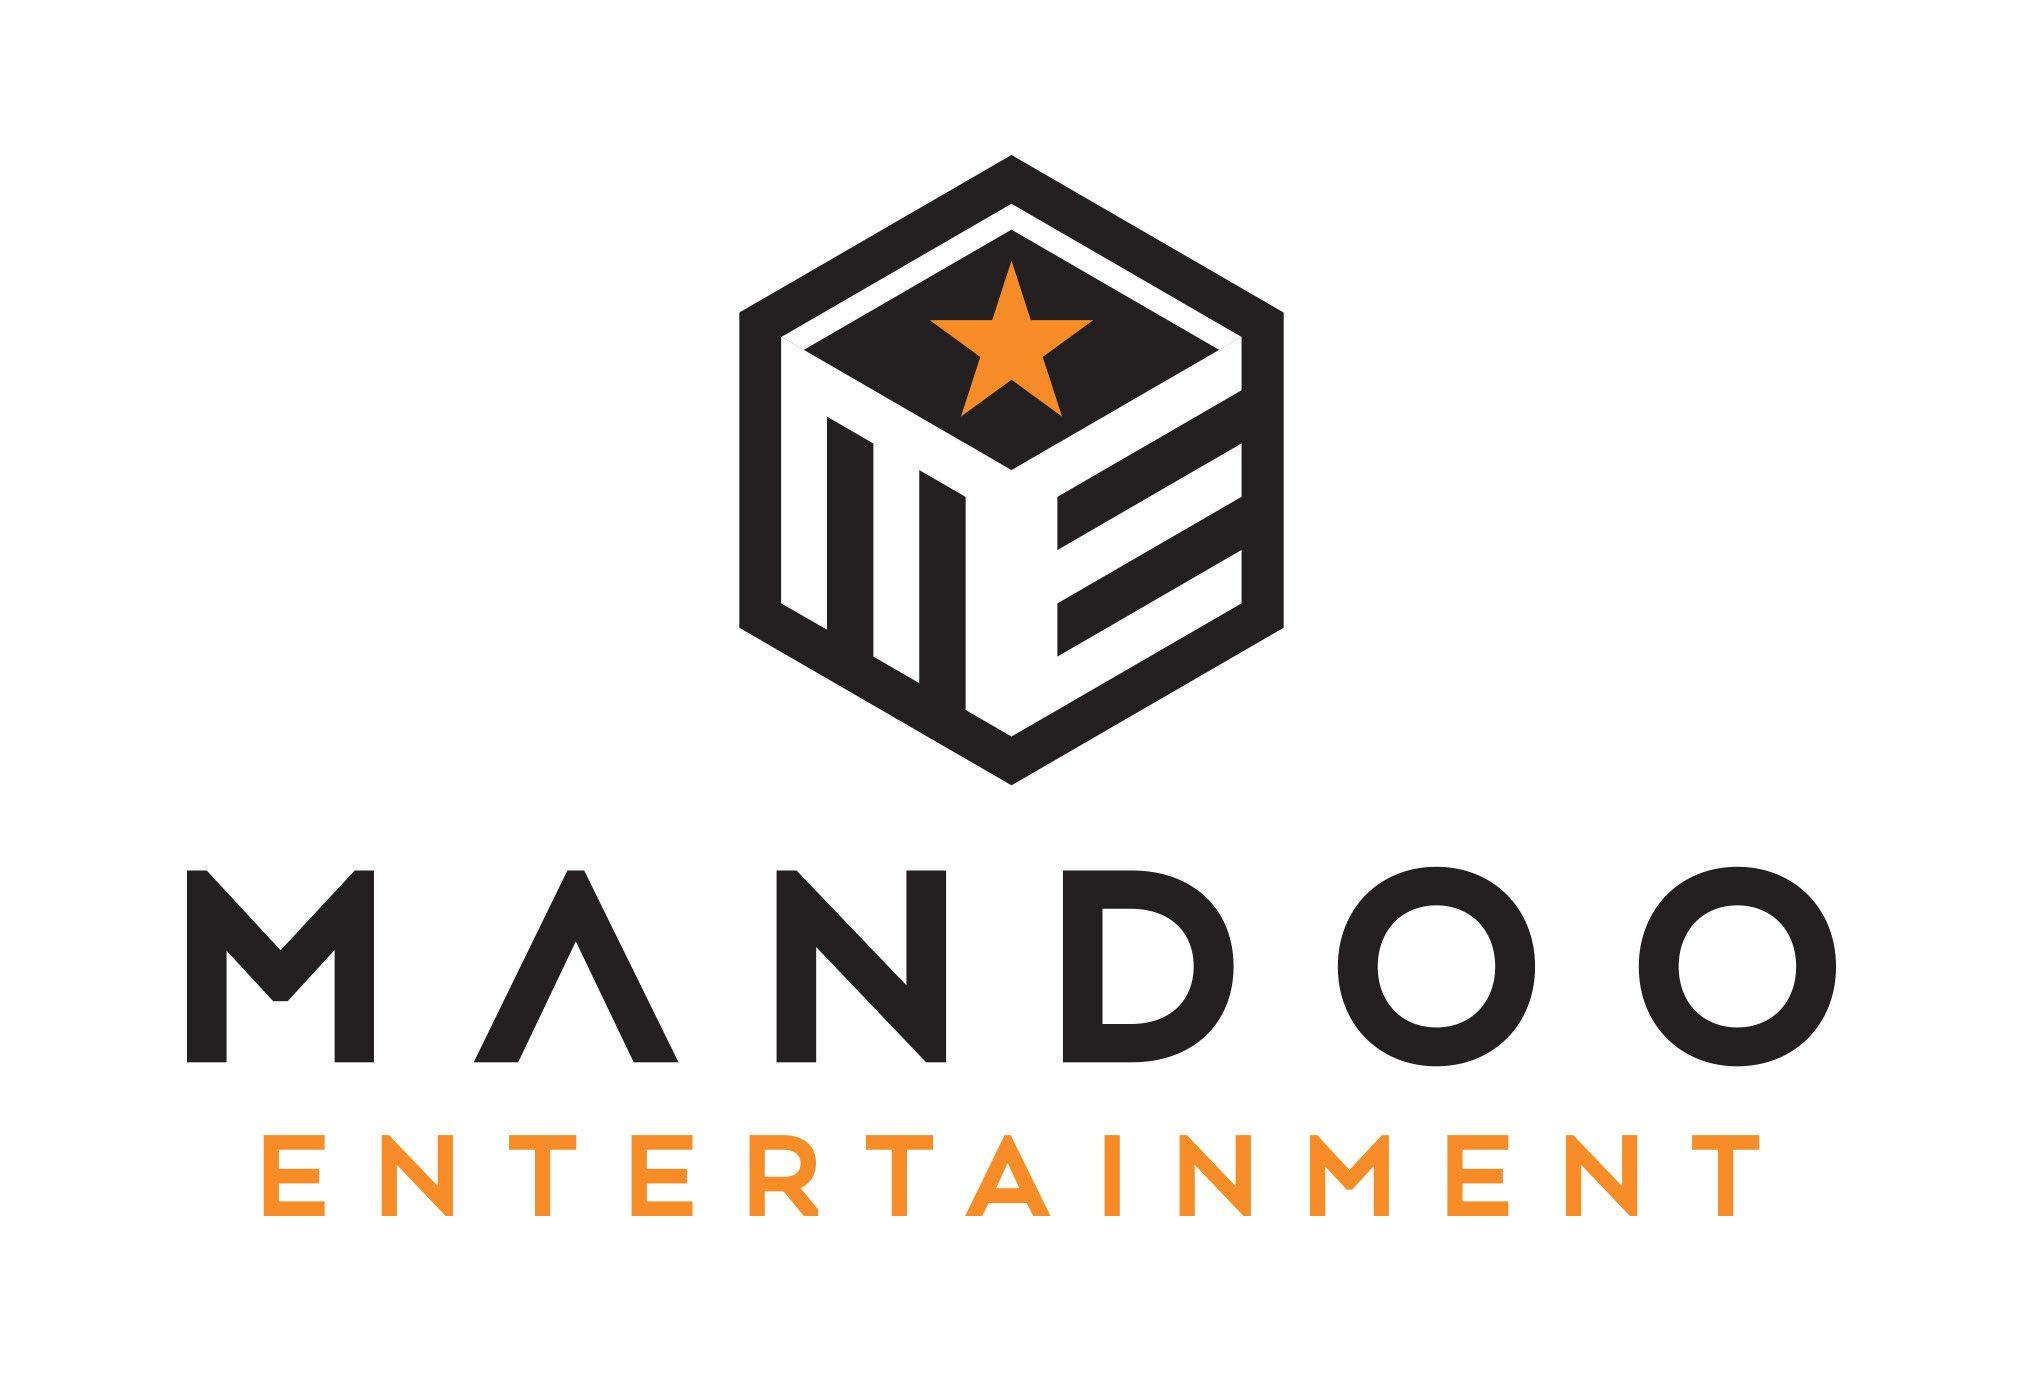 mandoo entertainment logo design by left hand design in austin texas